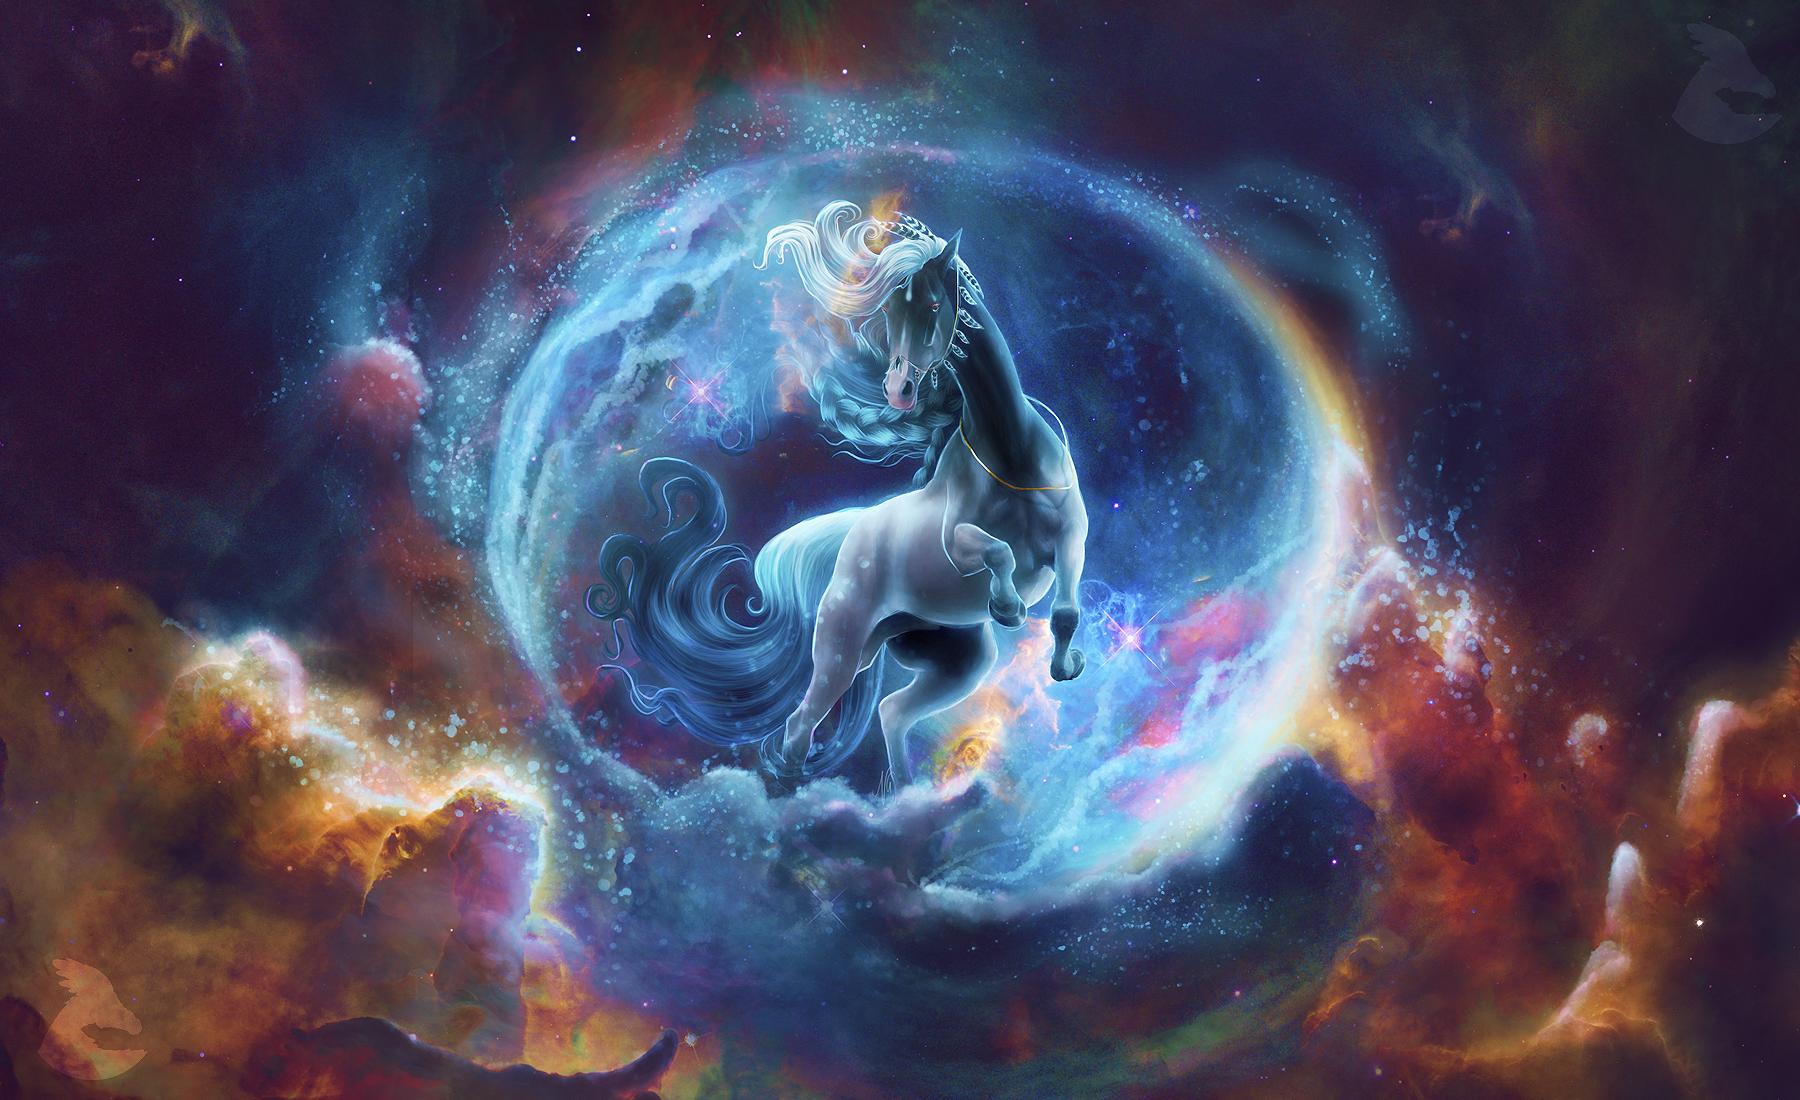 THE MIDNIGHT STAR by Nikkayla